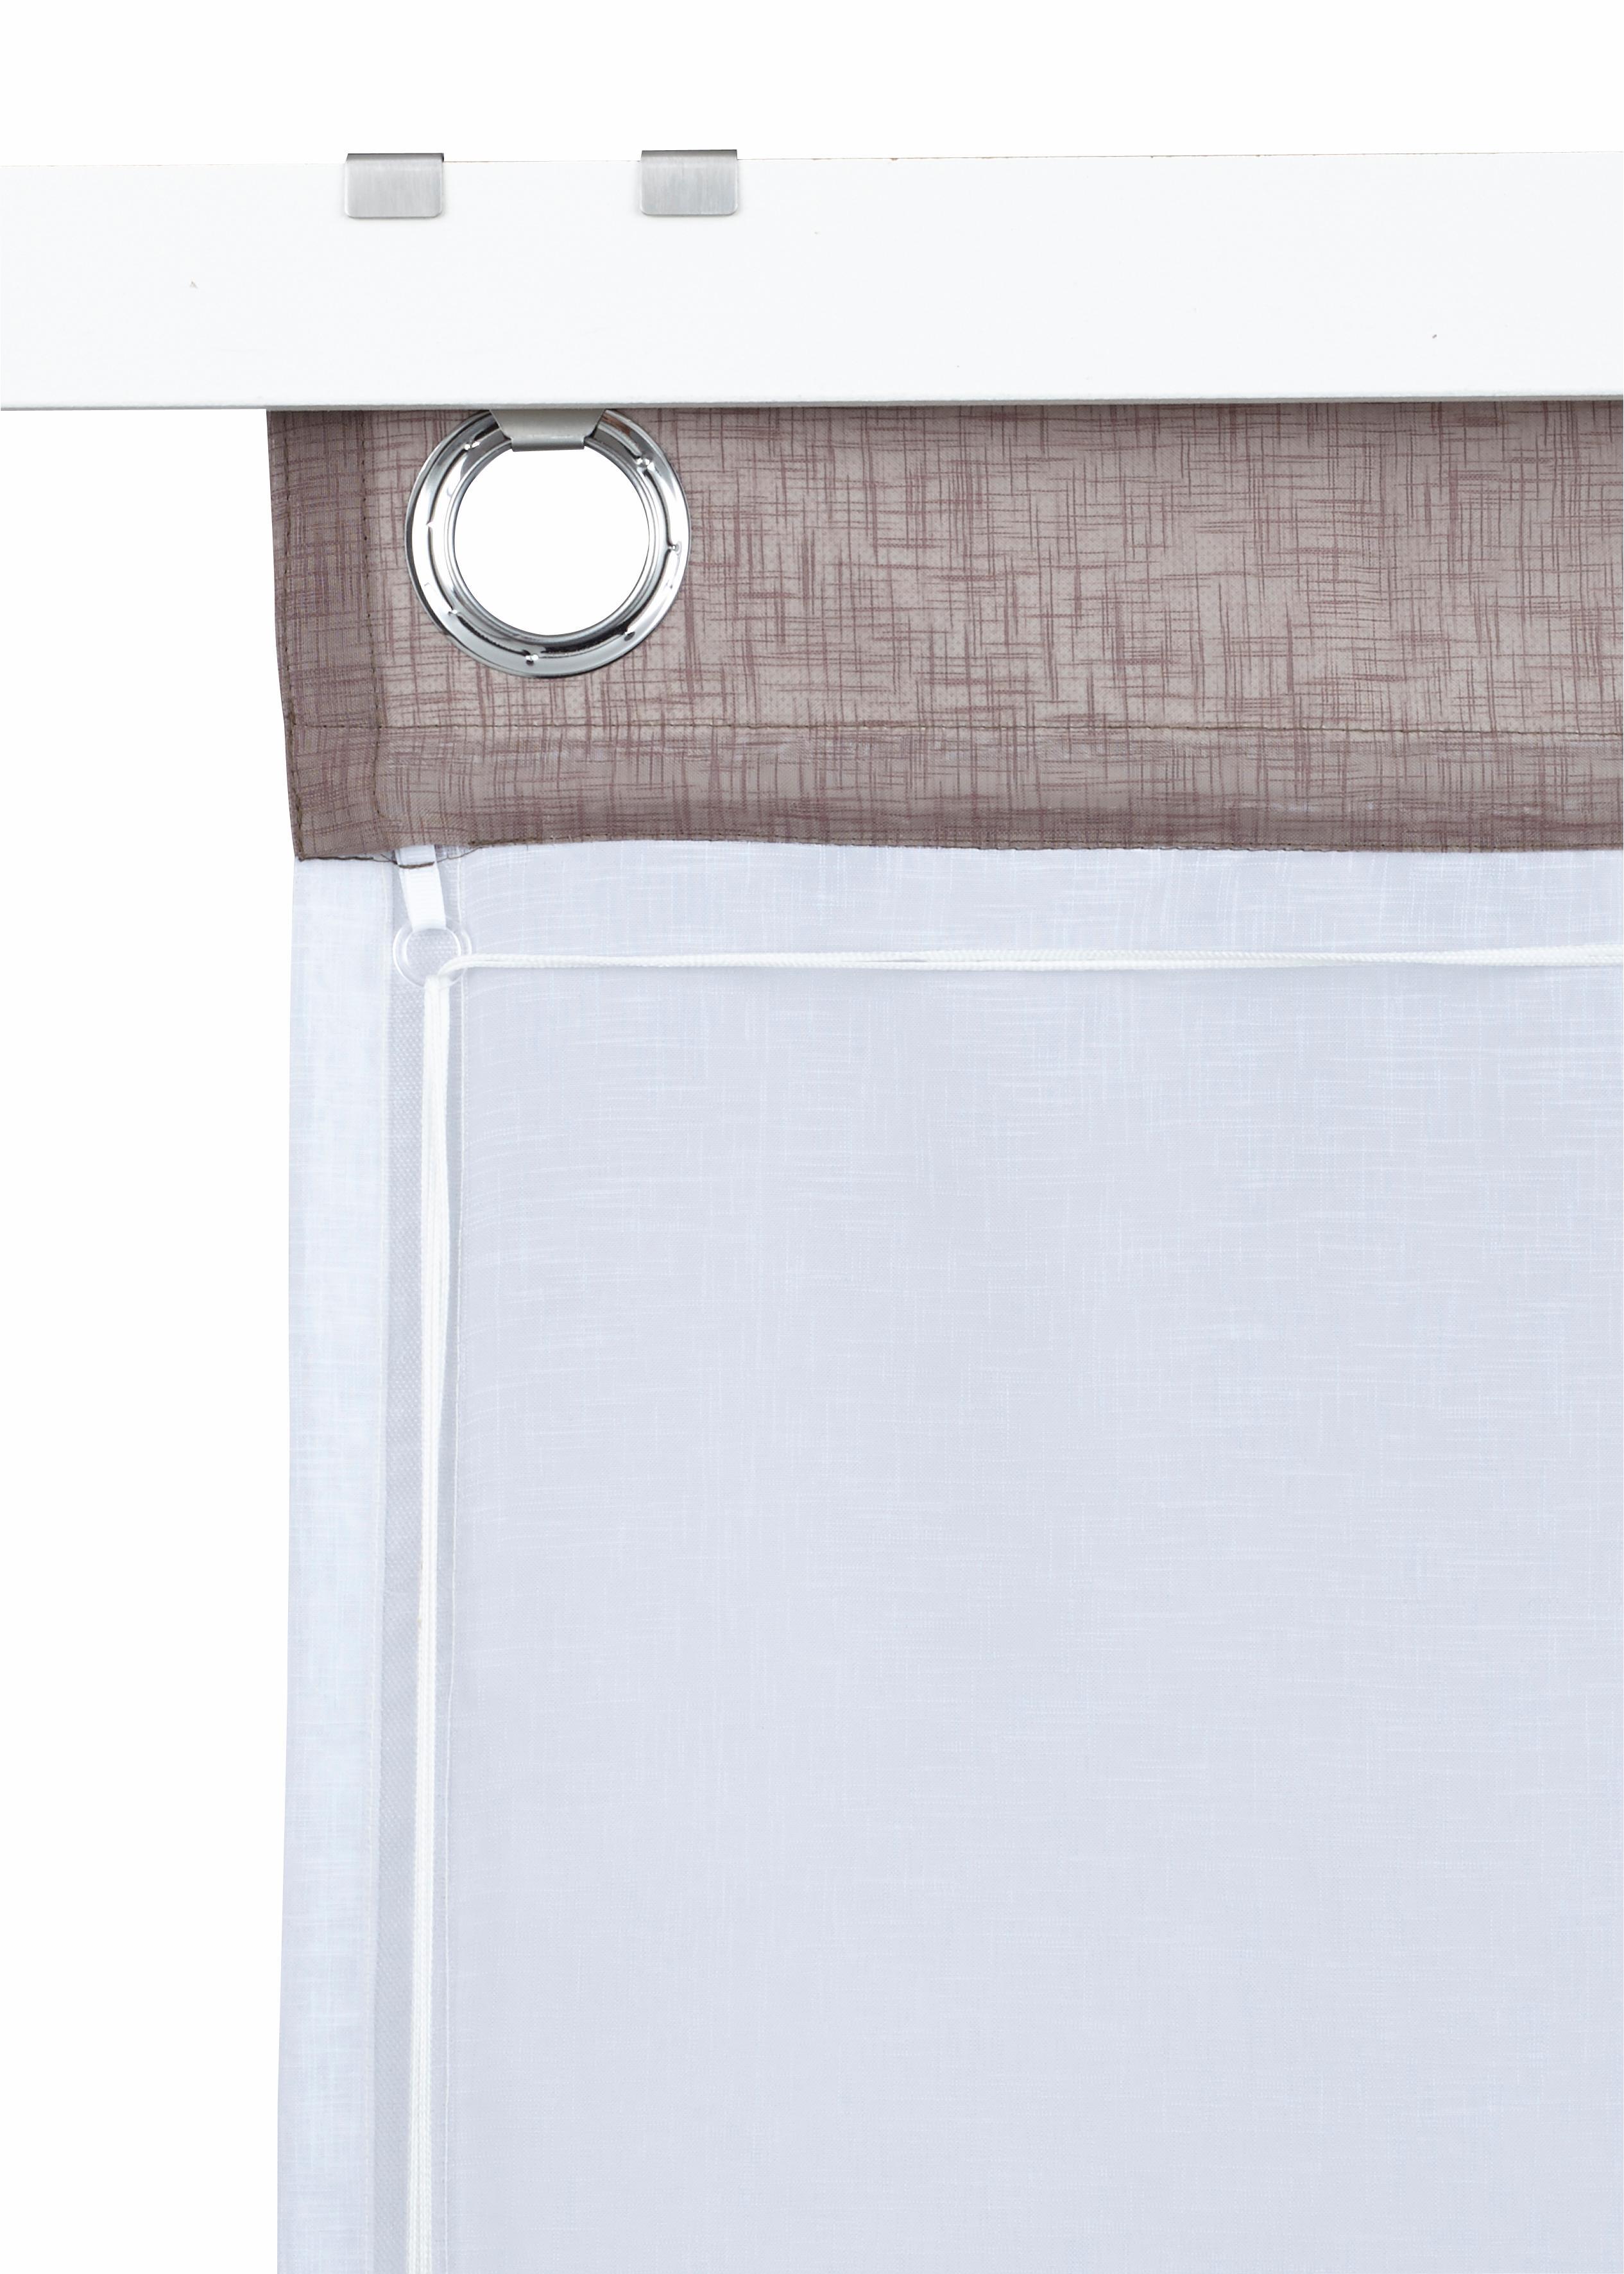 raffrollo kreta mit hakenaufh ngung ohne bohren haken my. Black Bedroom Furniture Sets. Home Design Ideas